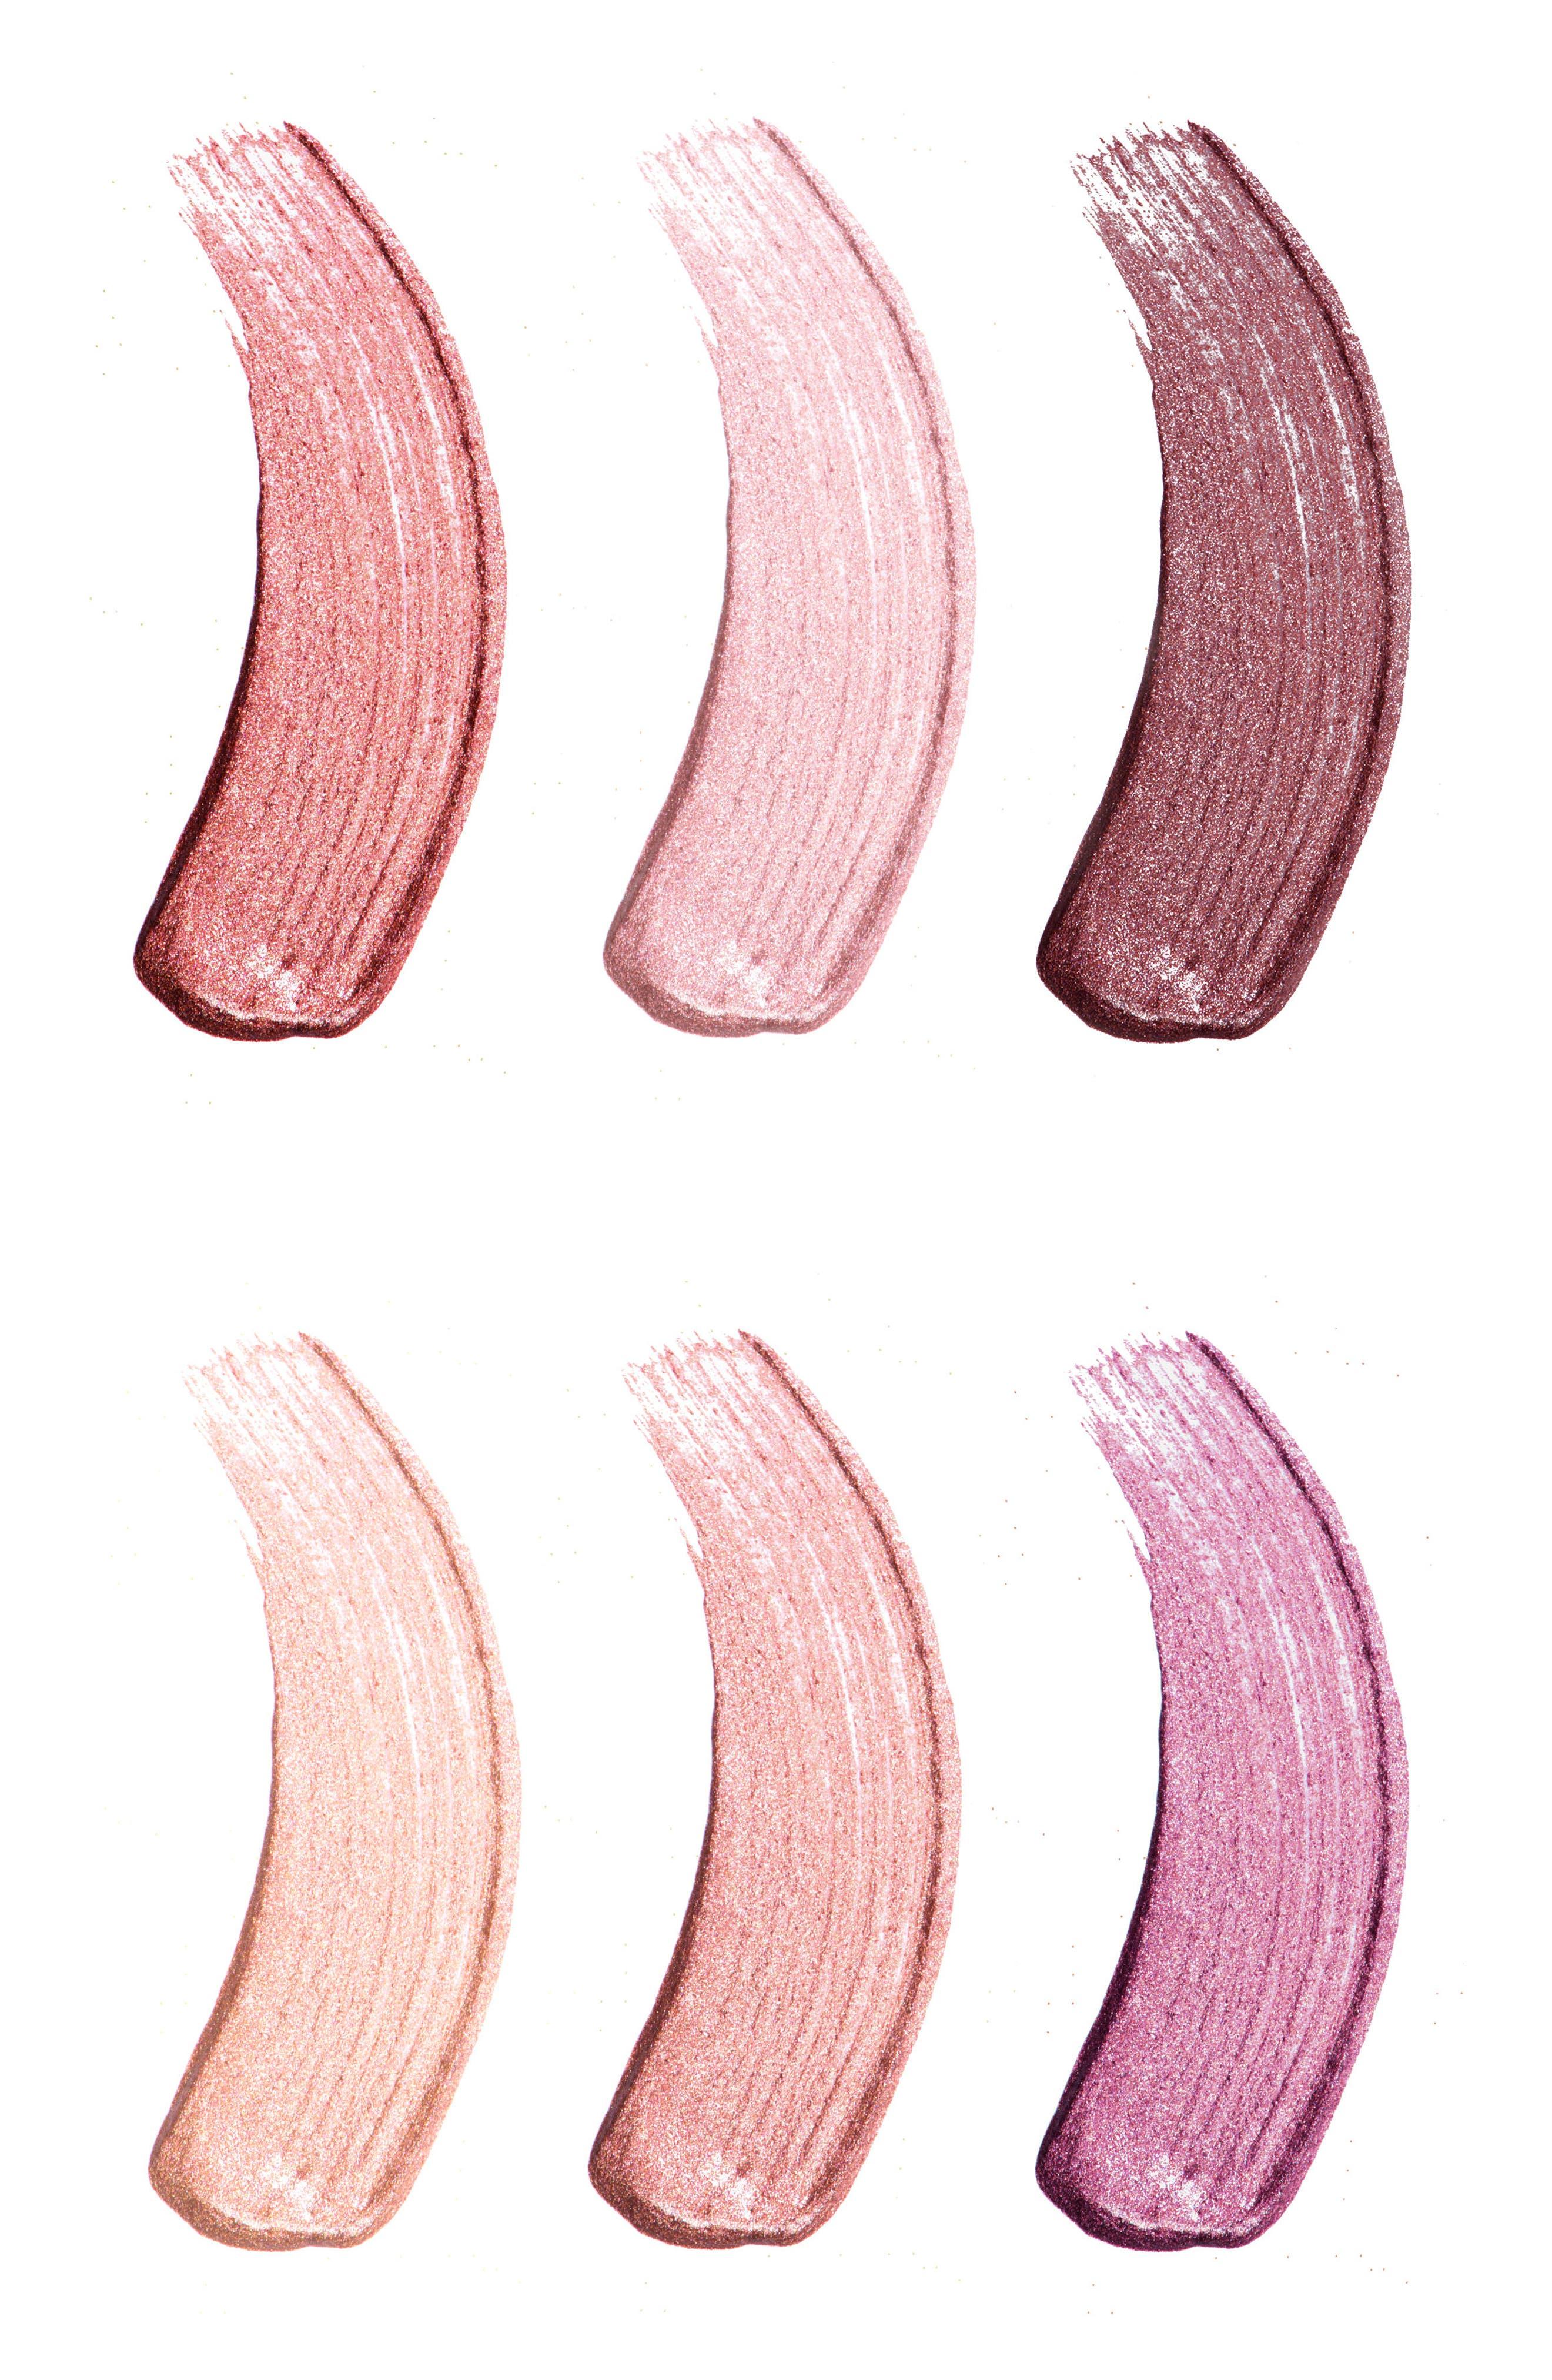 Best of Metallics Mini Long-Wear Lip Crème Liquid Lipstick Collection,                             Alternate thumbnail 3, color,                             000